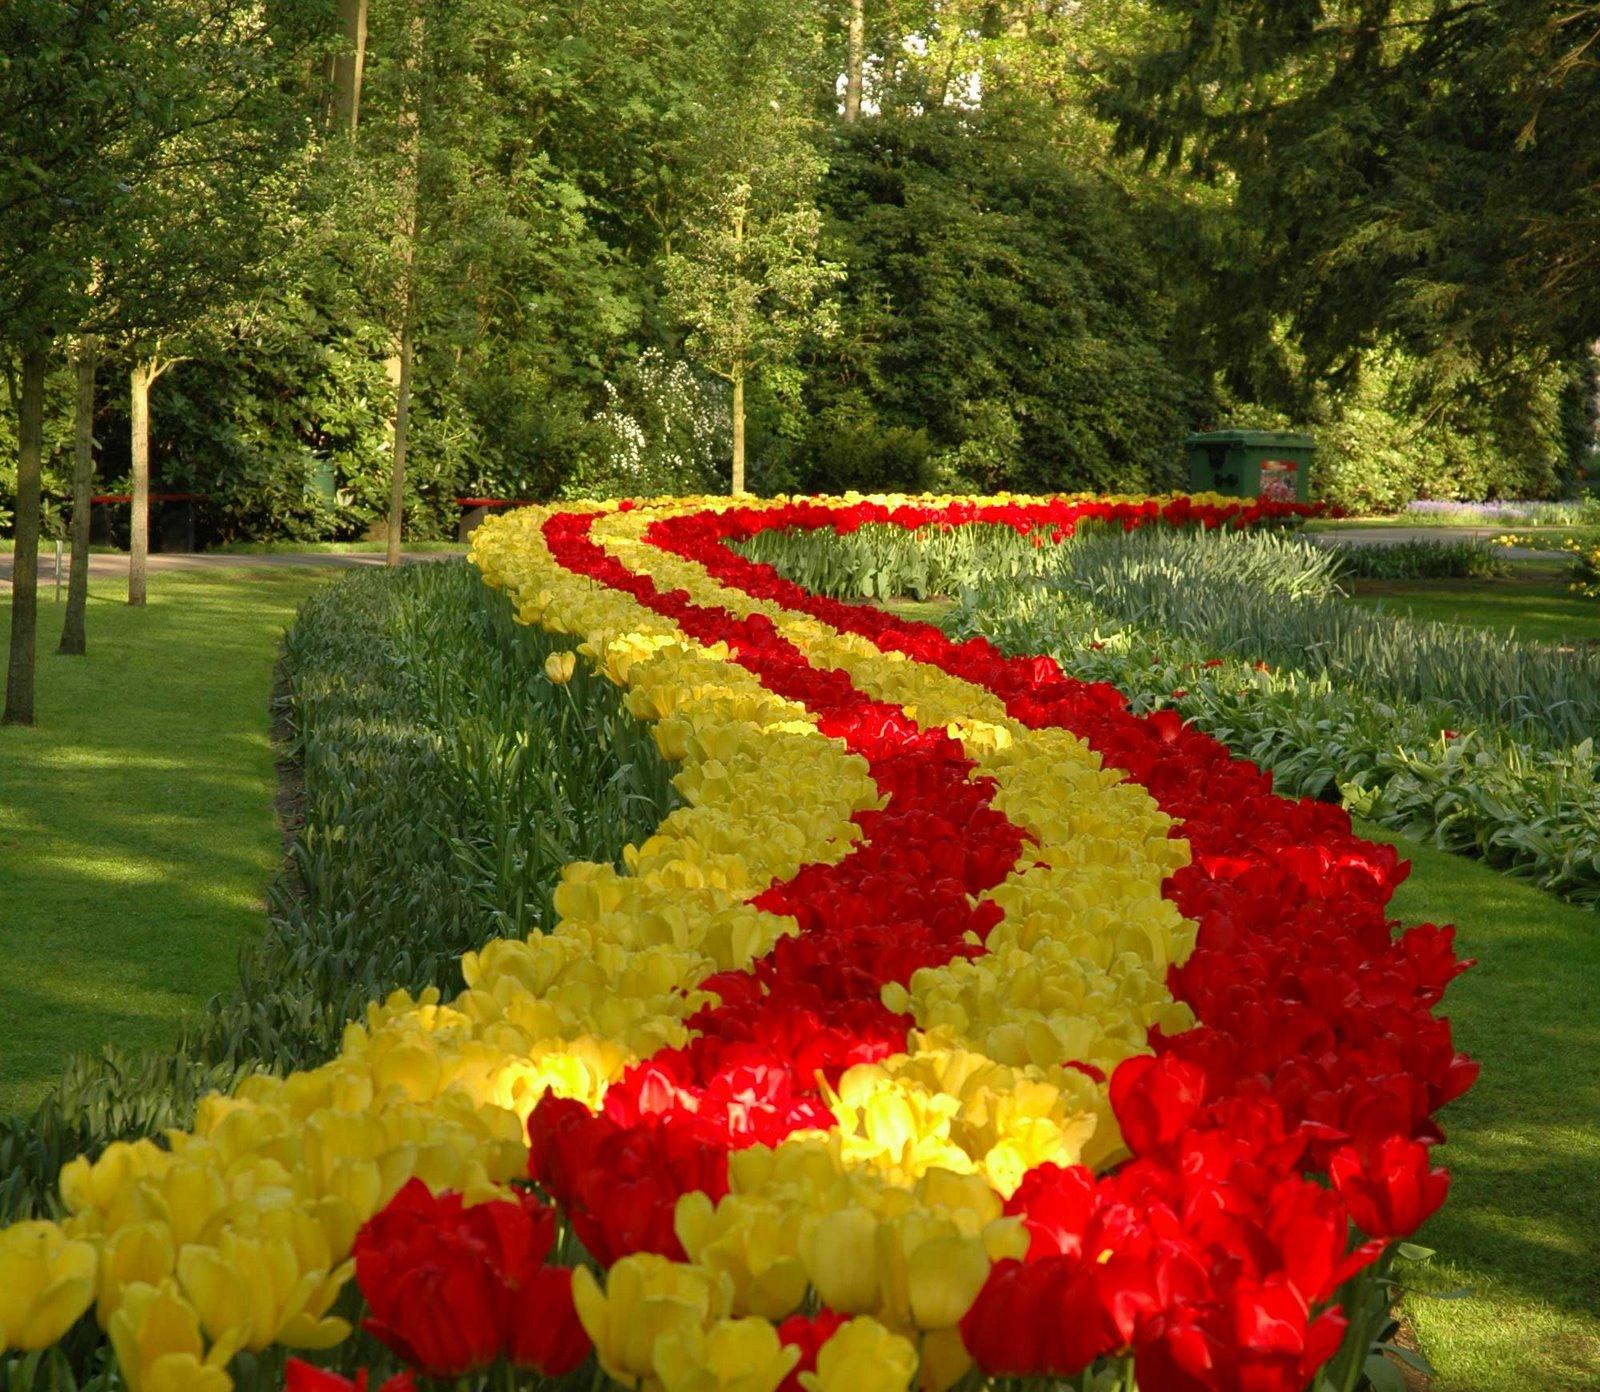 tulips garden wallpaper - photo #25